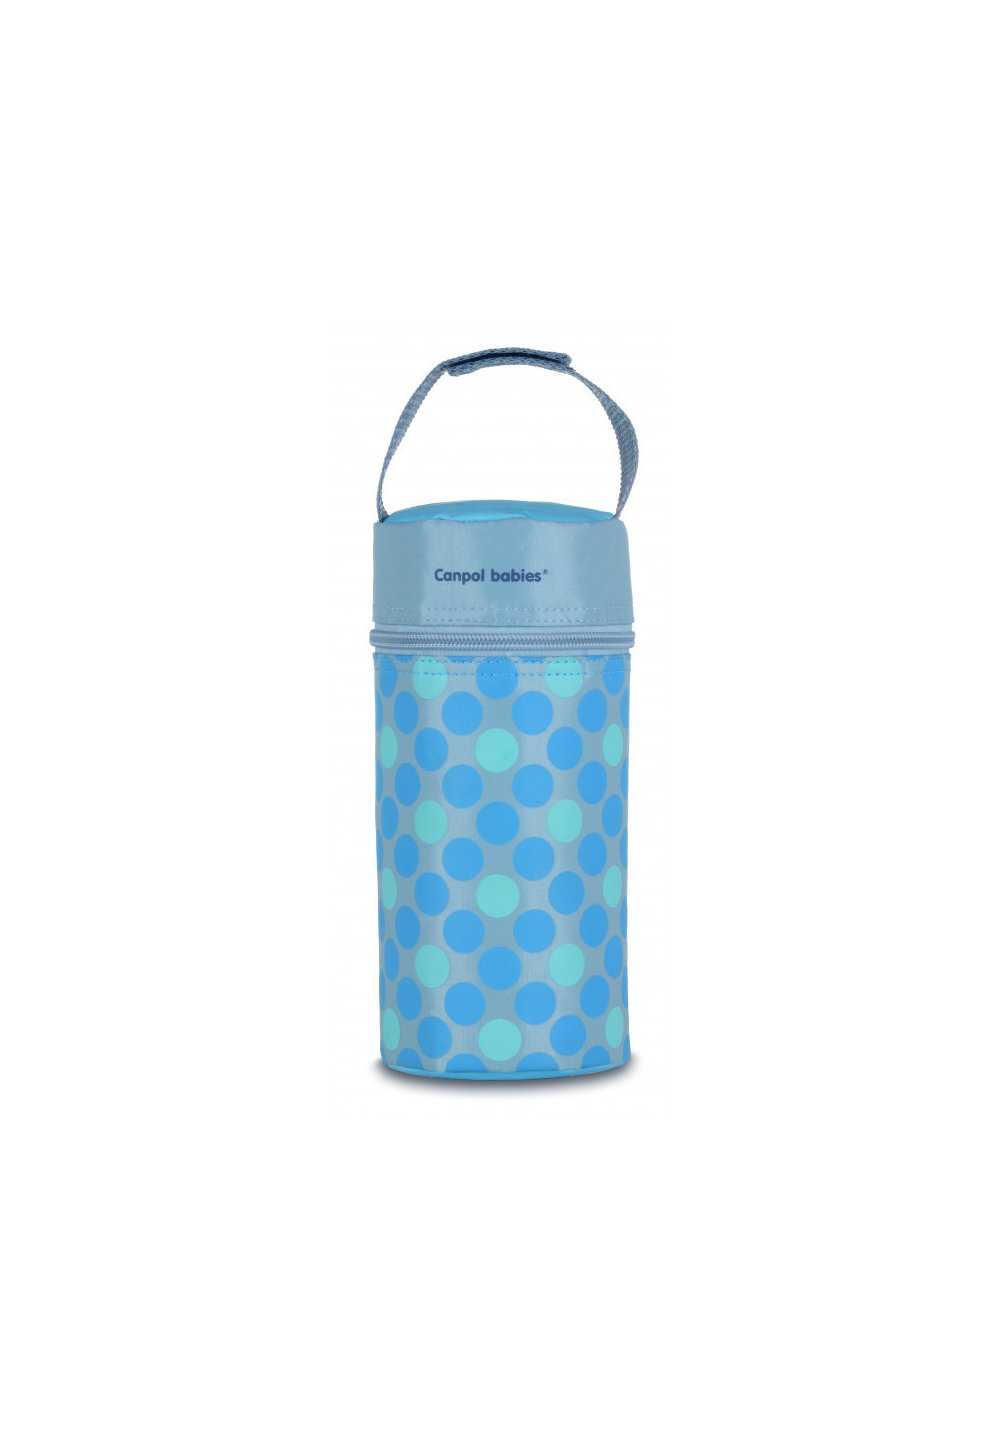 Izolator pentru biberoane, Canpol, gri cu buline albastre imagine